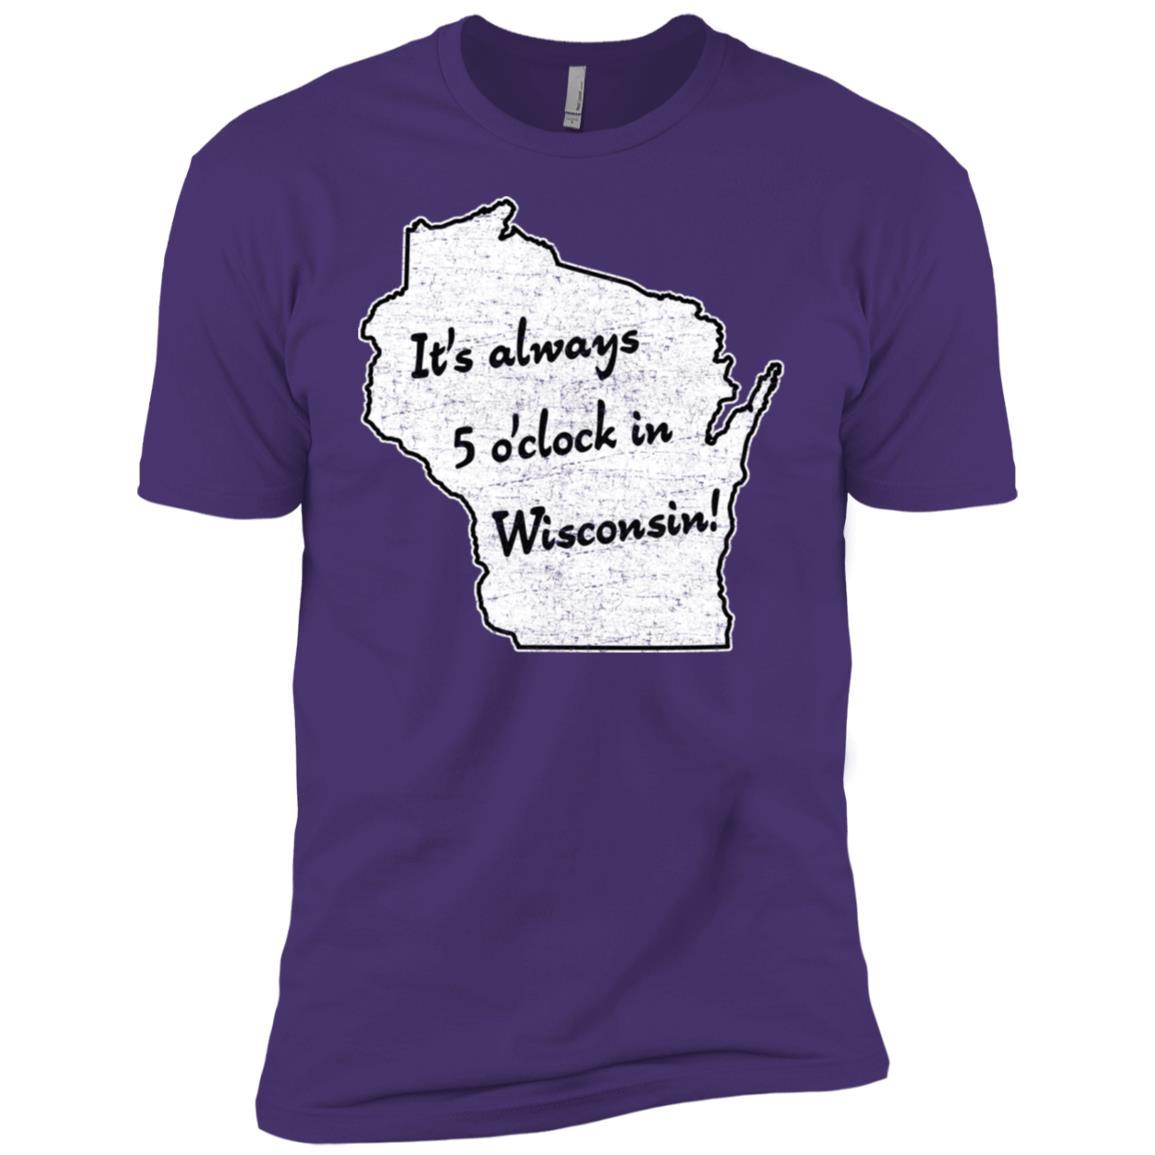 It's always 5 o'clock in Wisconsin sconnie wisco Men Short Sleeve T-Shirt